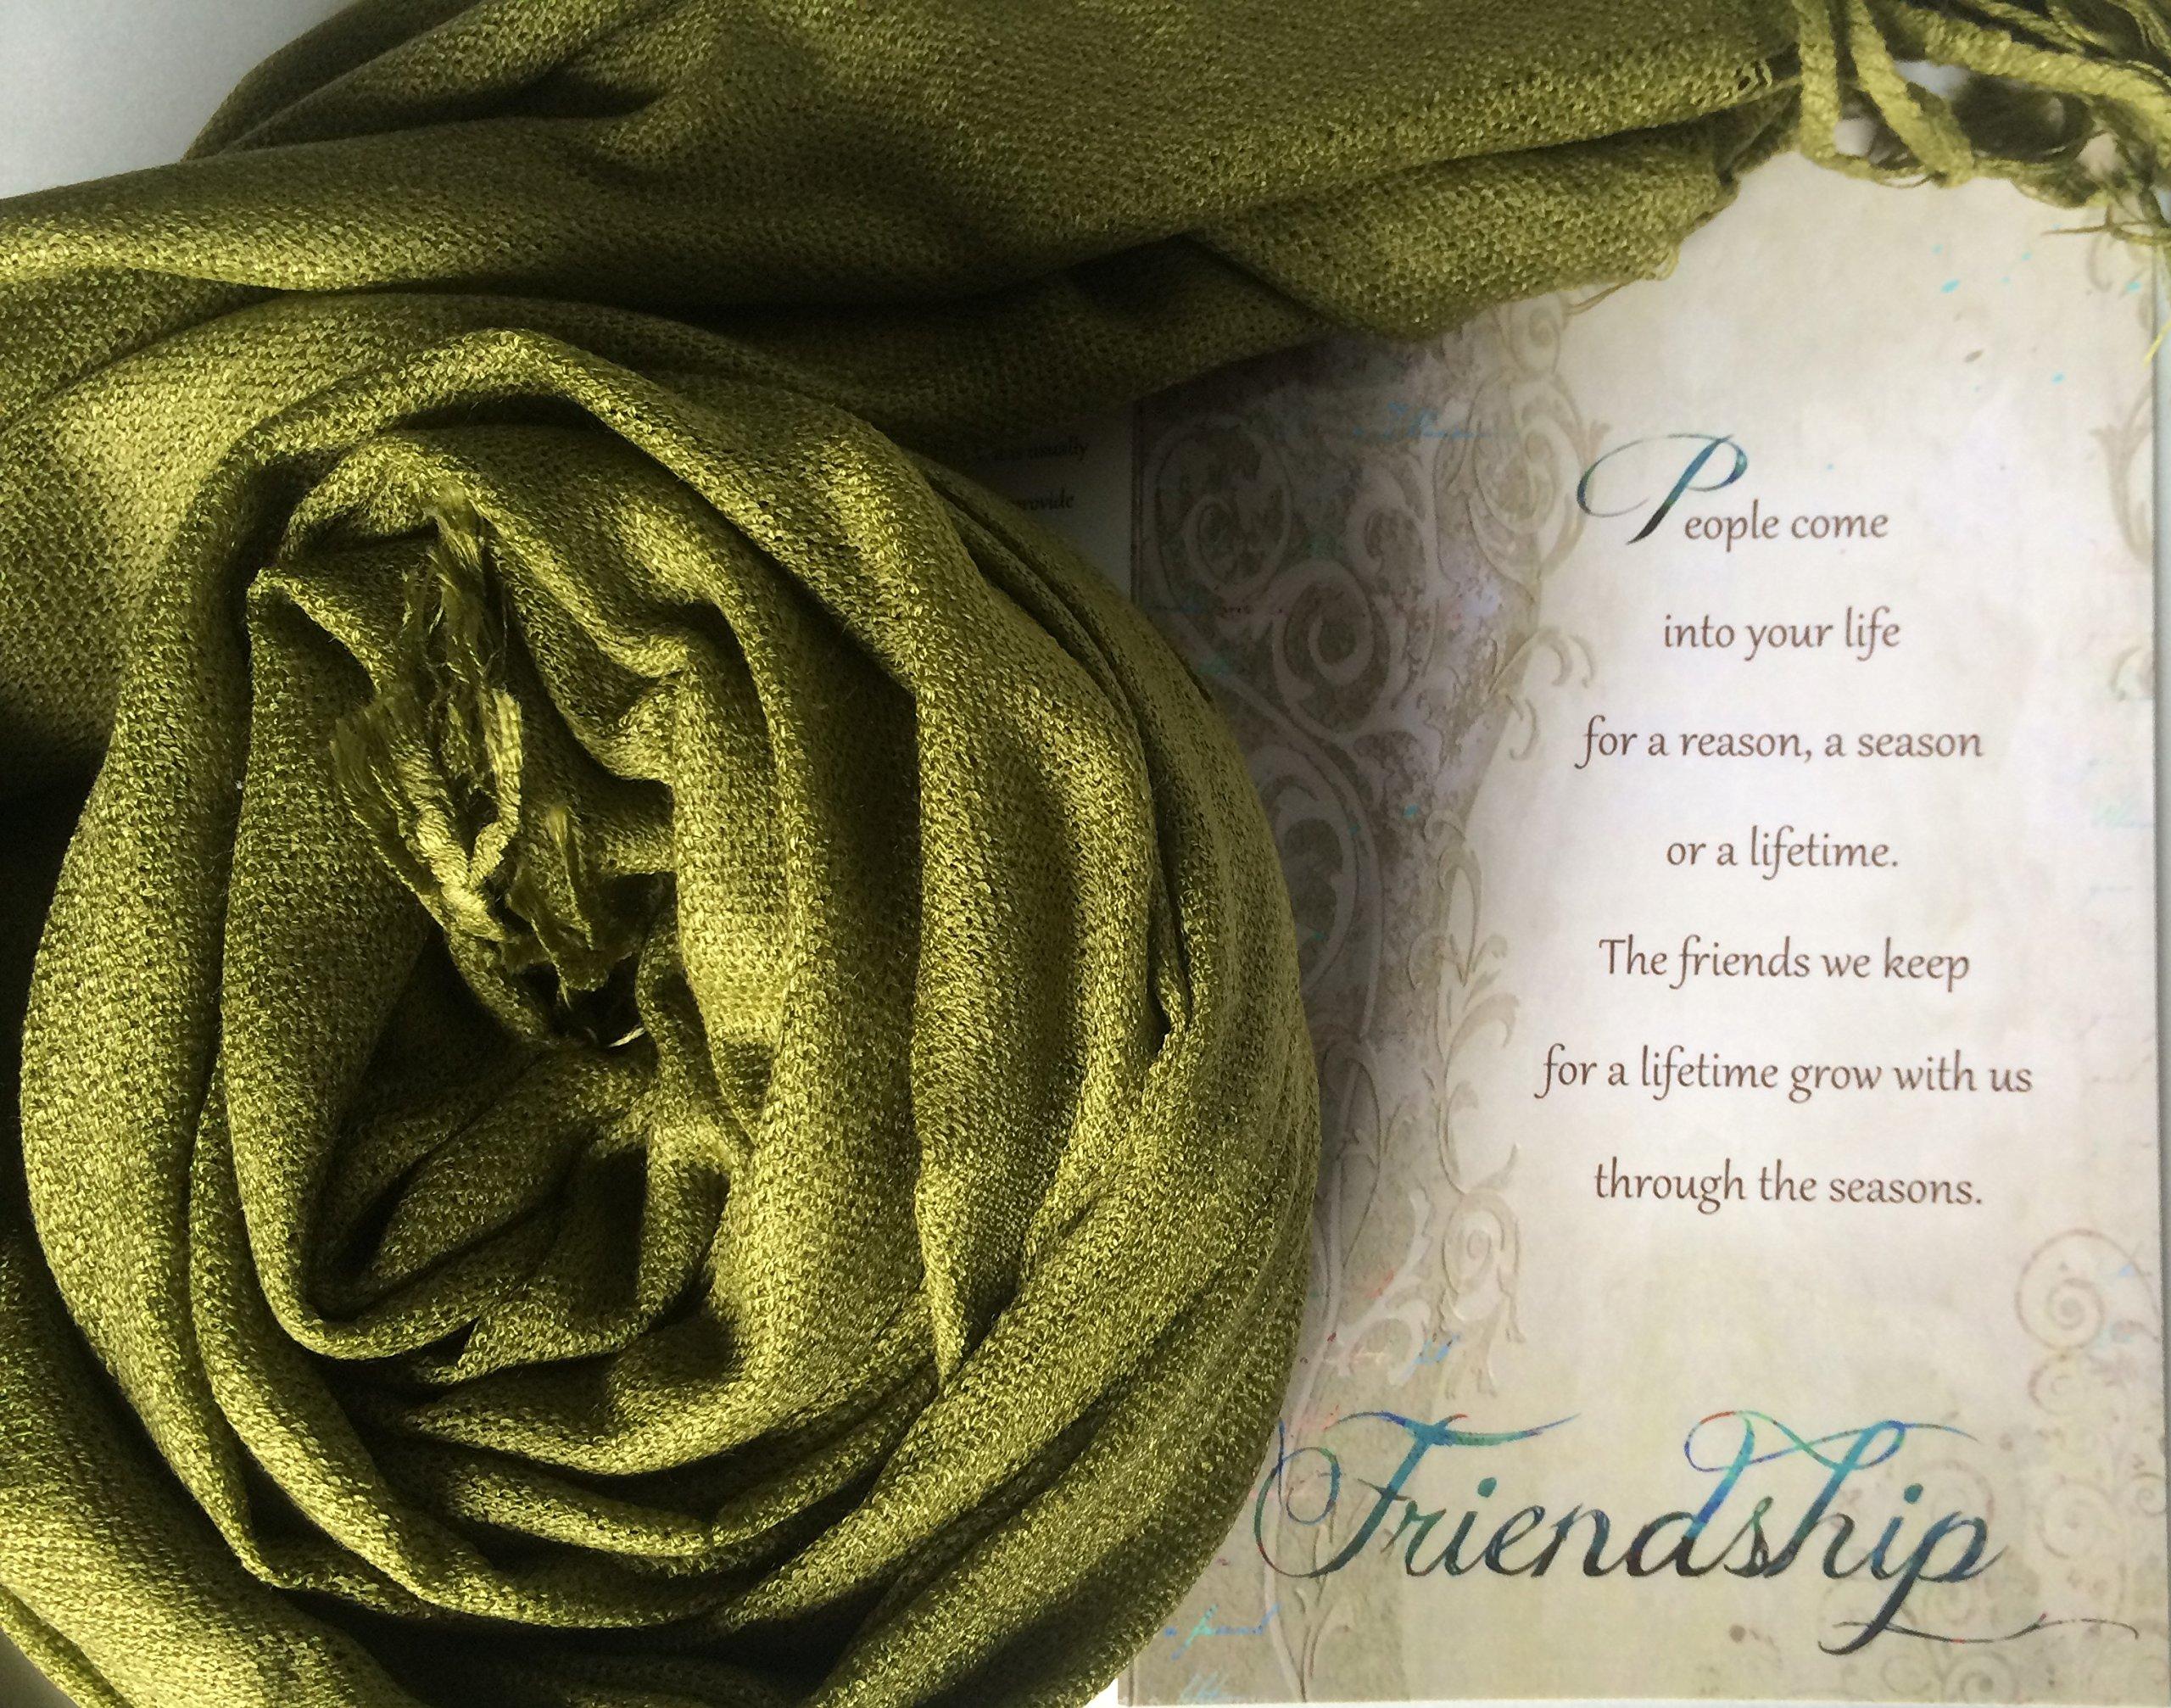 b702aa6791e0 Smiling Wisdom - Olive Earth Green Pashmina Scarf - Reason Season Lifetime  Friendship Greeting Card Gift Set - For Good Best Friend BFF - Pashmina    Silk ...